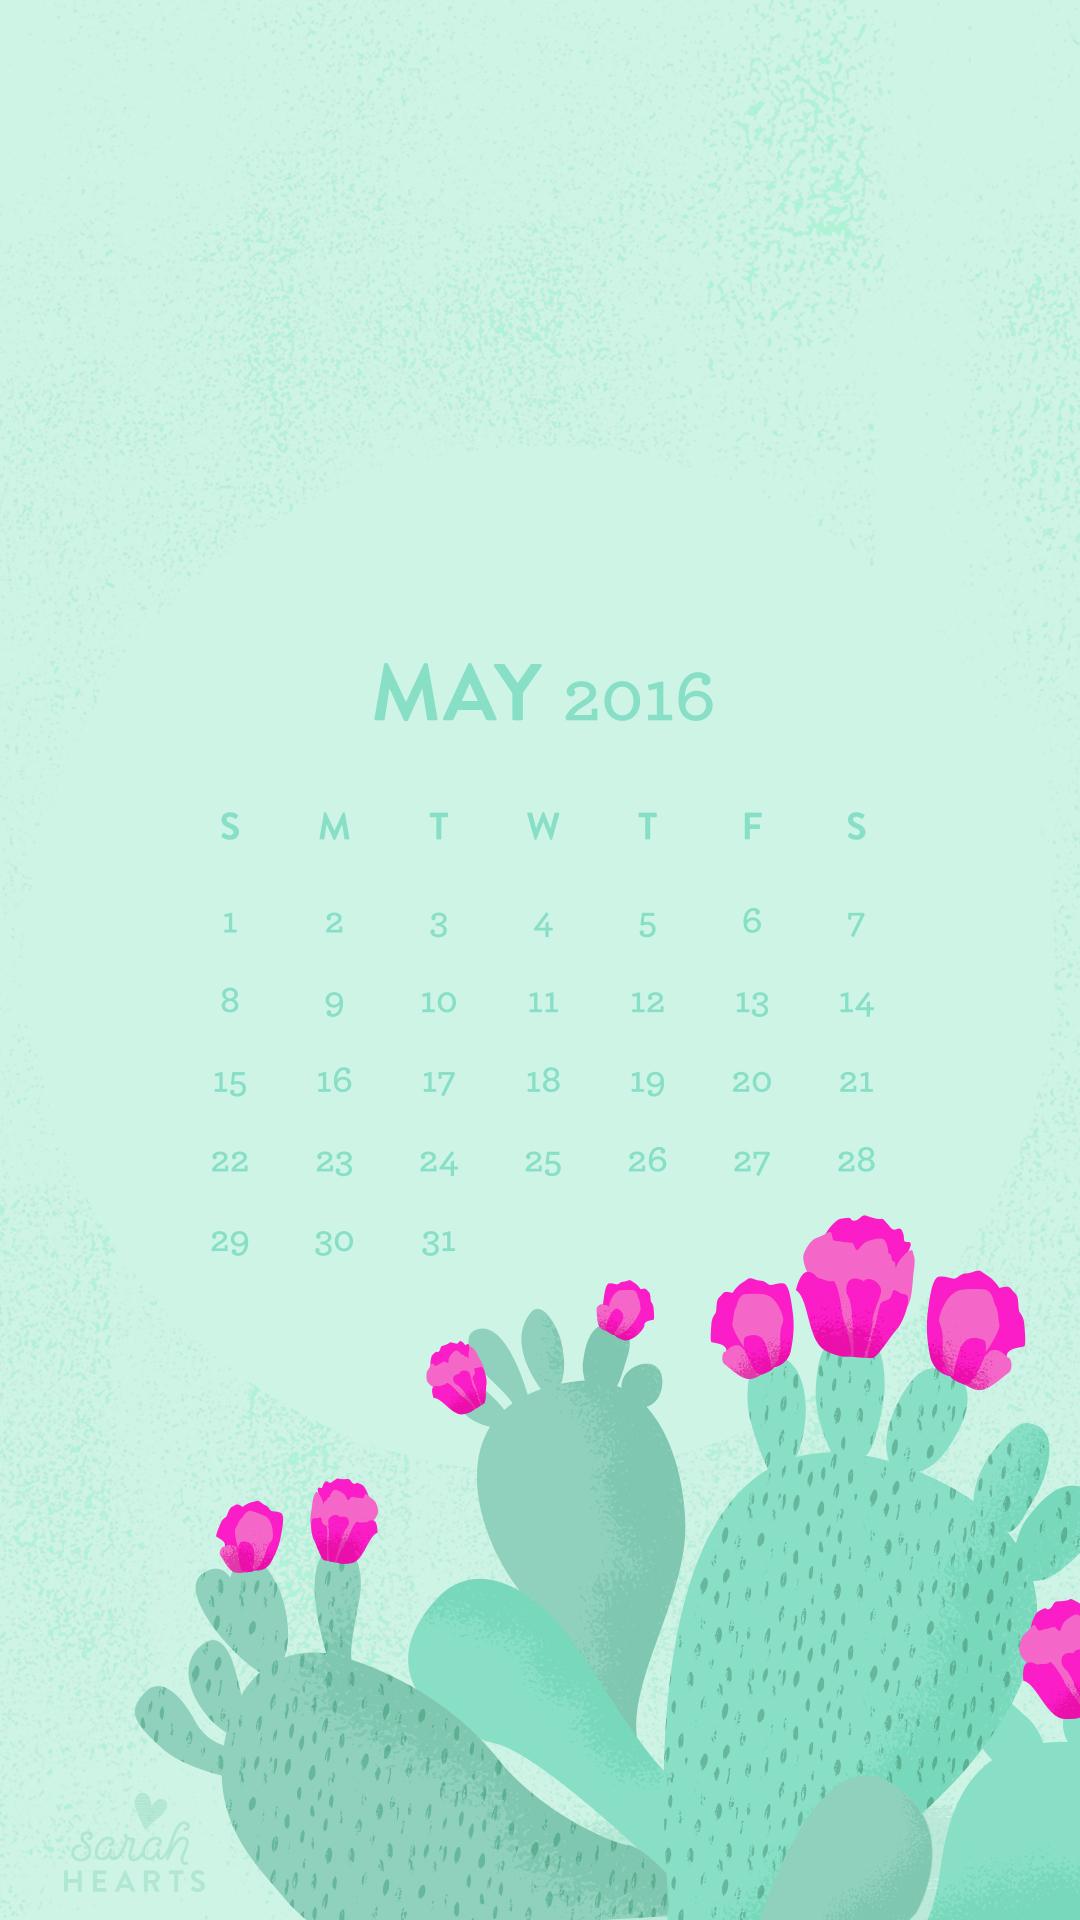 Tree Quote Wallpaper Mac May 2016 Cactus Calendar Wallpaper Sarah Hearts